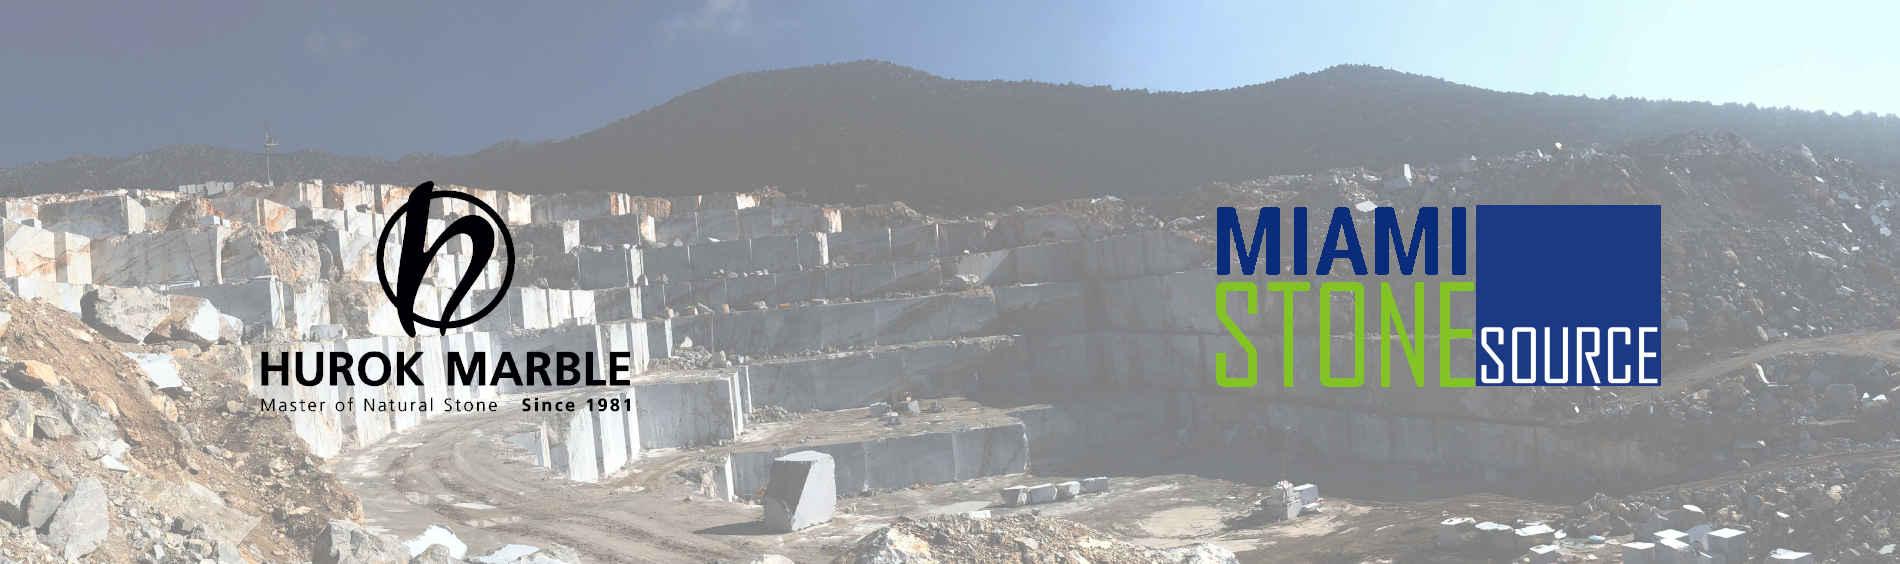 since 1981 atlantic stone source history logos